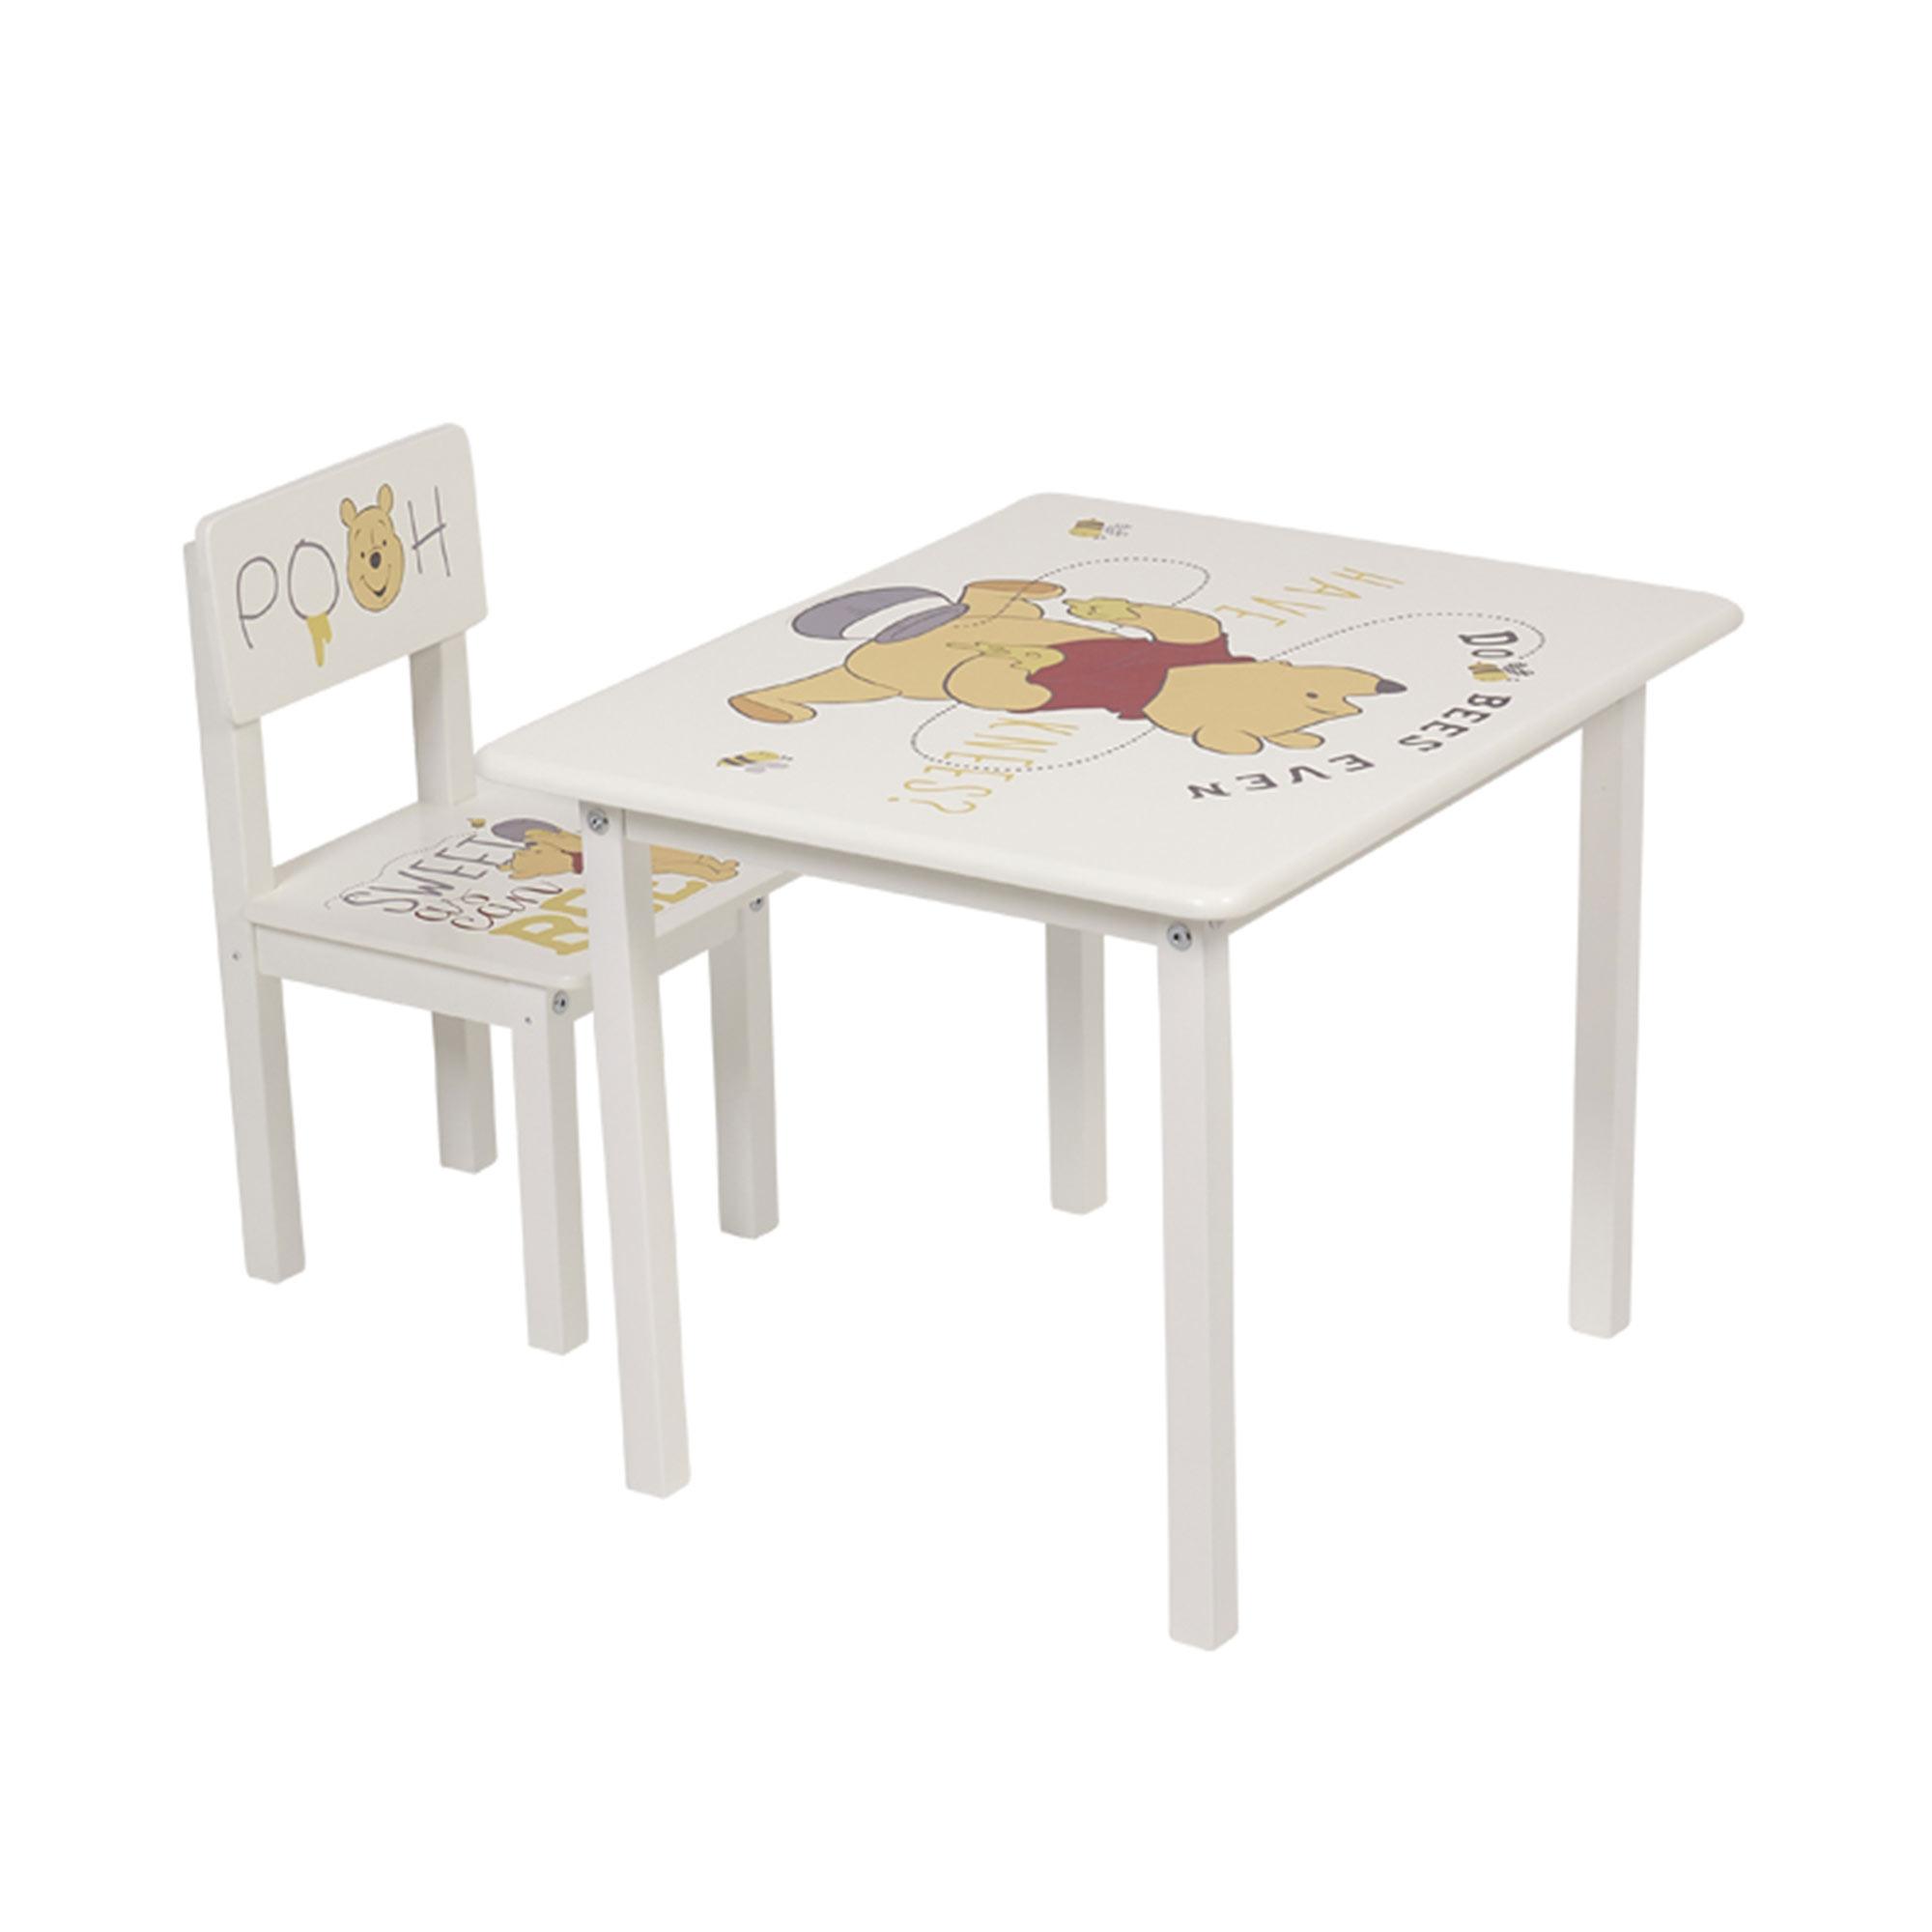 Фото - Комплект детской мебели Polini Kids Disney baby 105 S, Медвежонок Винни, белый шкаф трехсекционный polini kids disney baby медвежонок винни и его друзья белый макиато 190х135х52